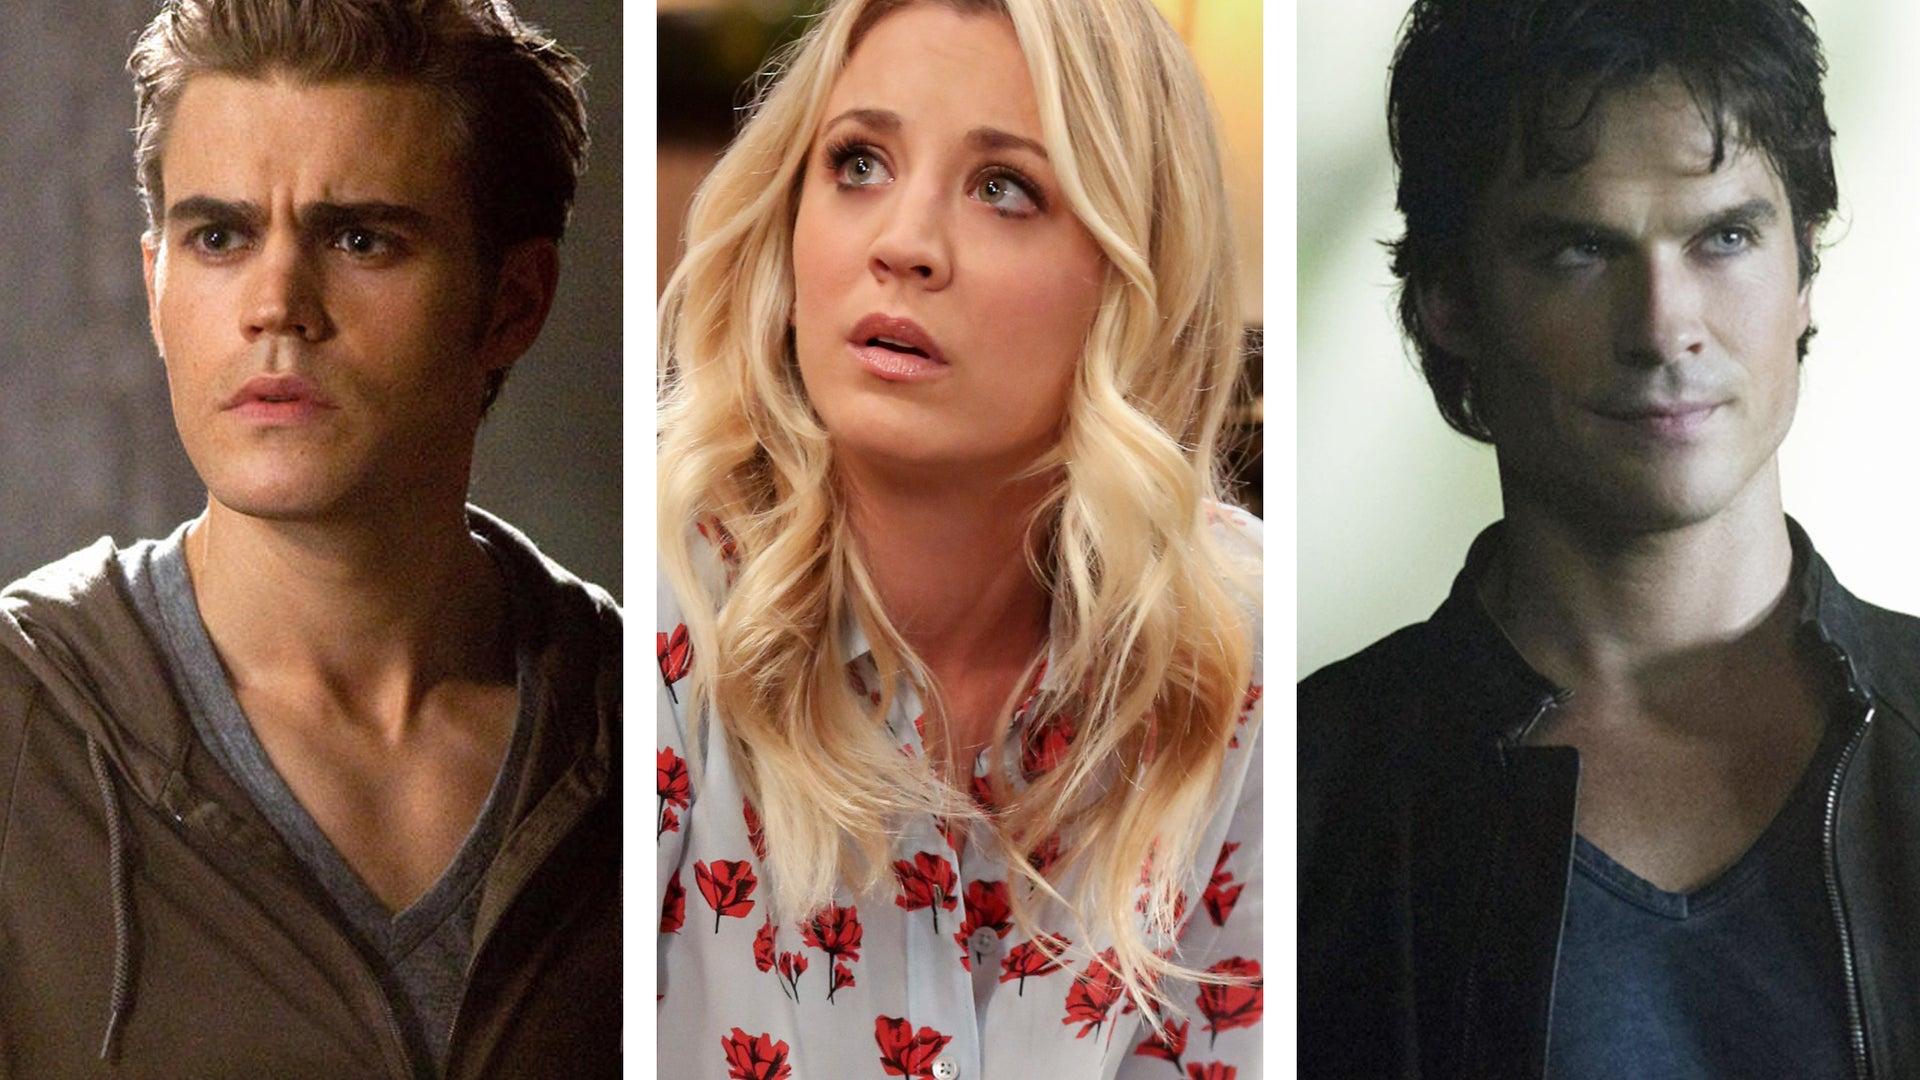 Paul Wesley, The Vampire Diaries, Kaley Cuoco, The Big Bang Theory, Ian Somerhalder, The Vampire Diaries